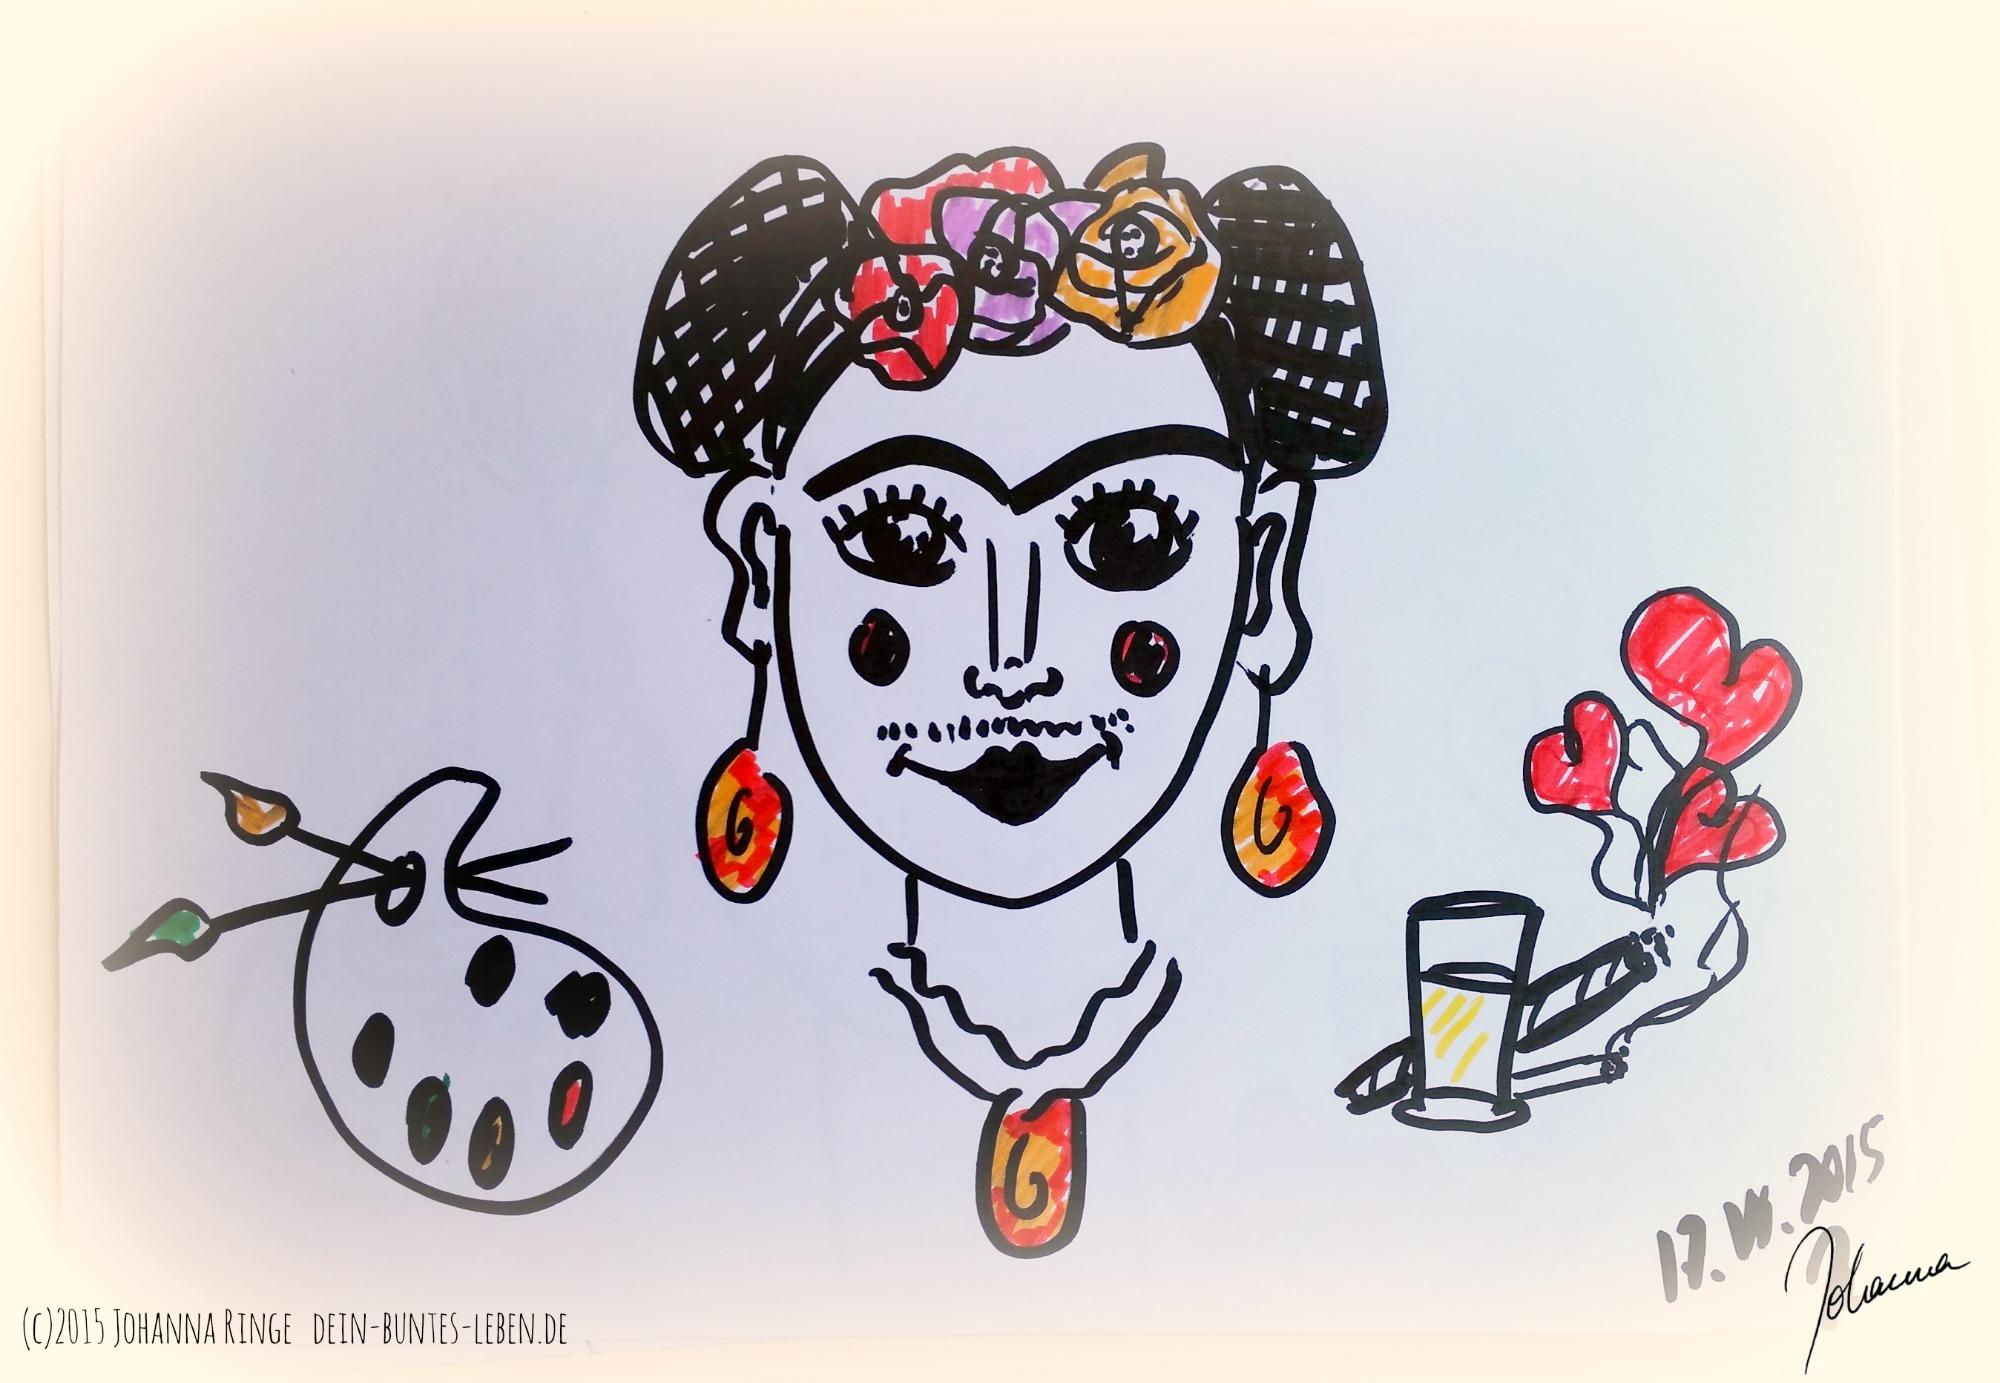 Deine innere Frida (c)2015 Johanna Ringe dein-buntes-leben.de